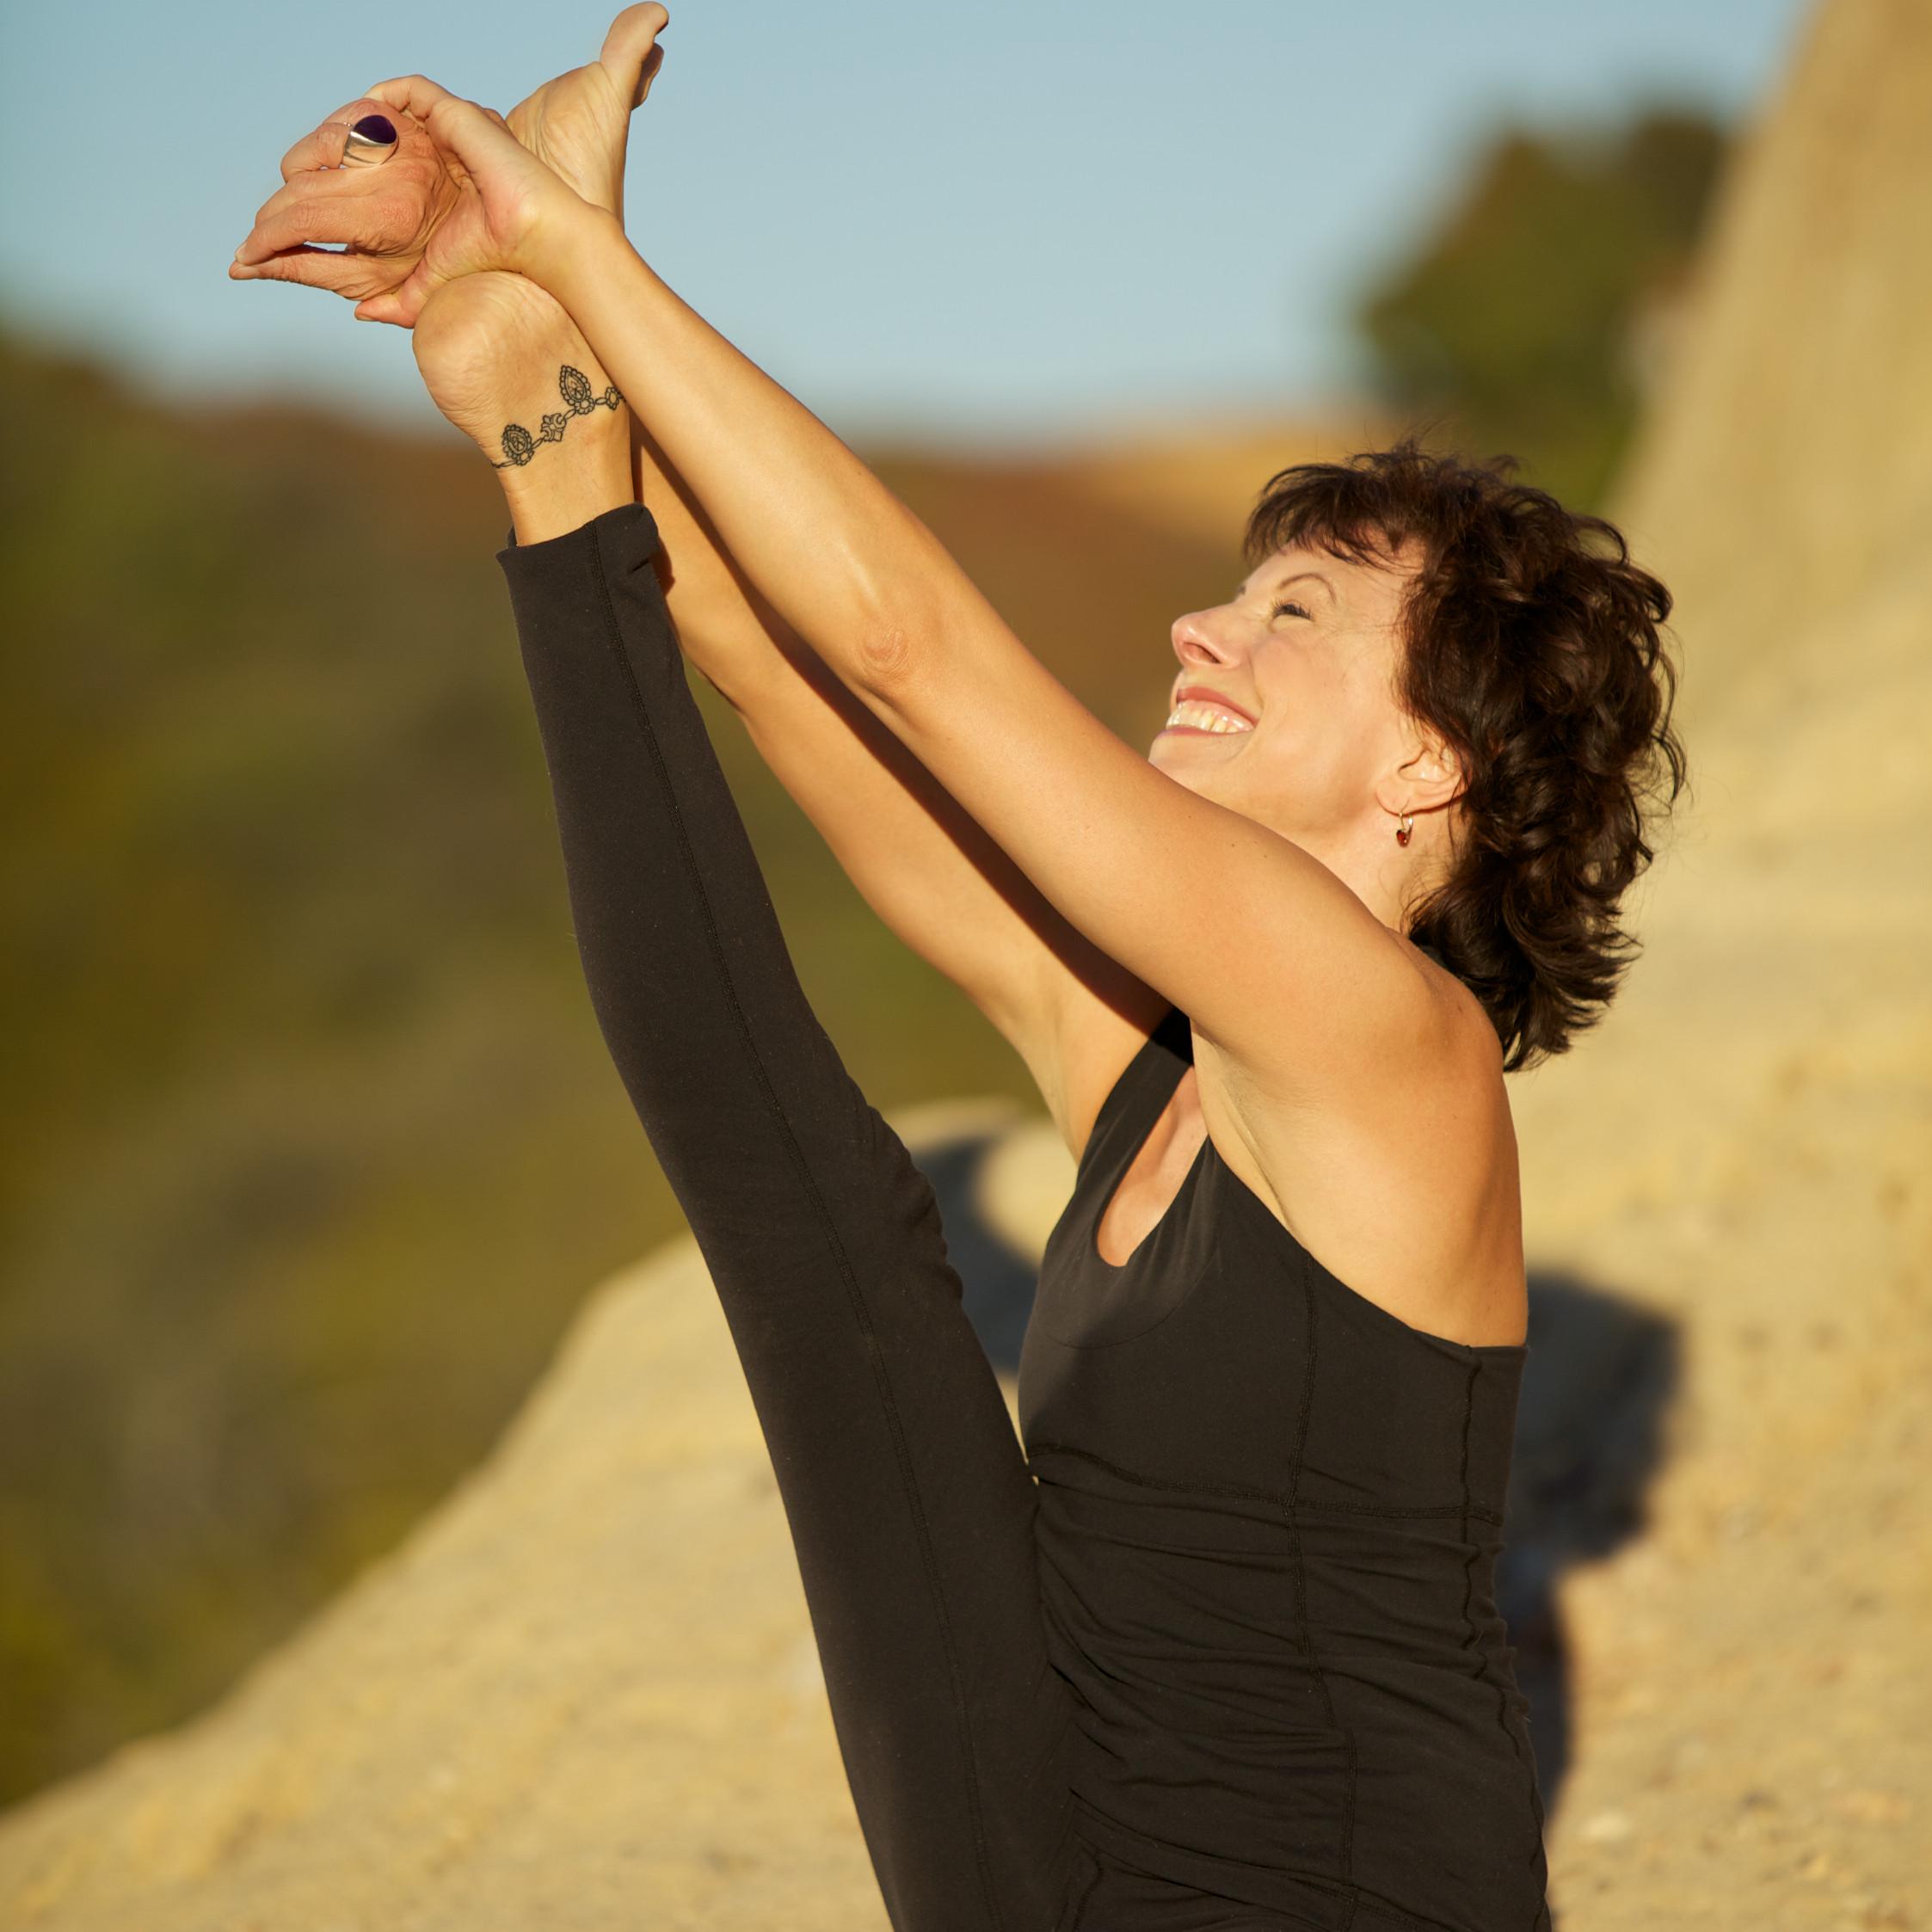 Jeanne Heileman Krounchasana Heron Pose Los Angeles Yoga Teacher